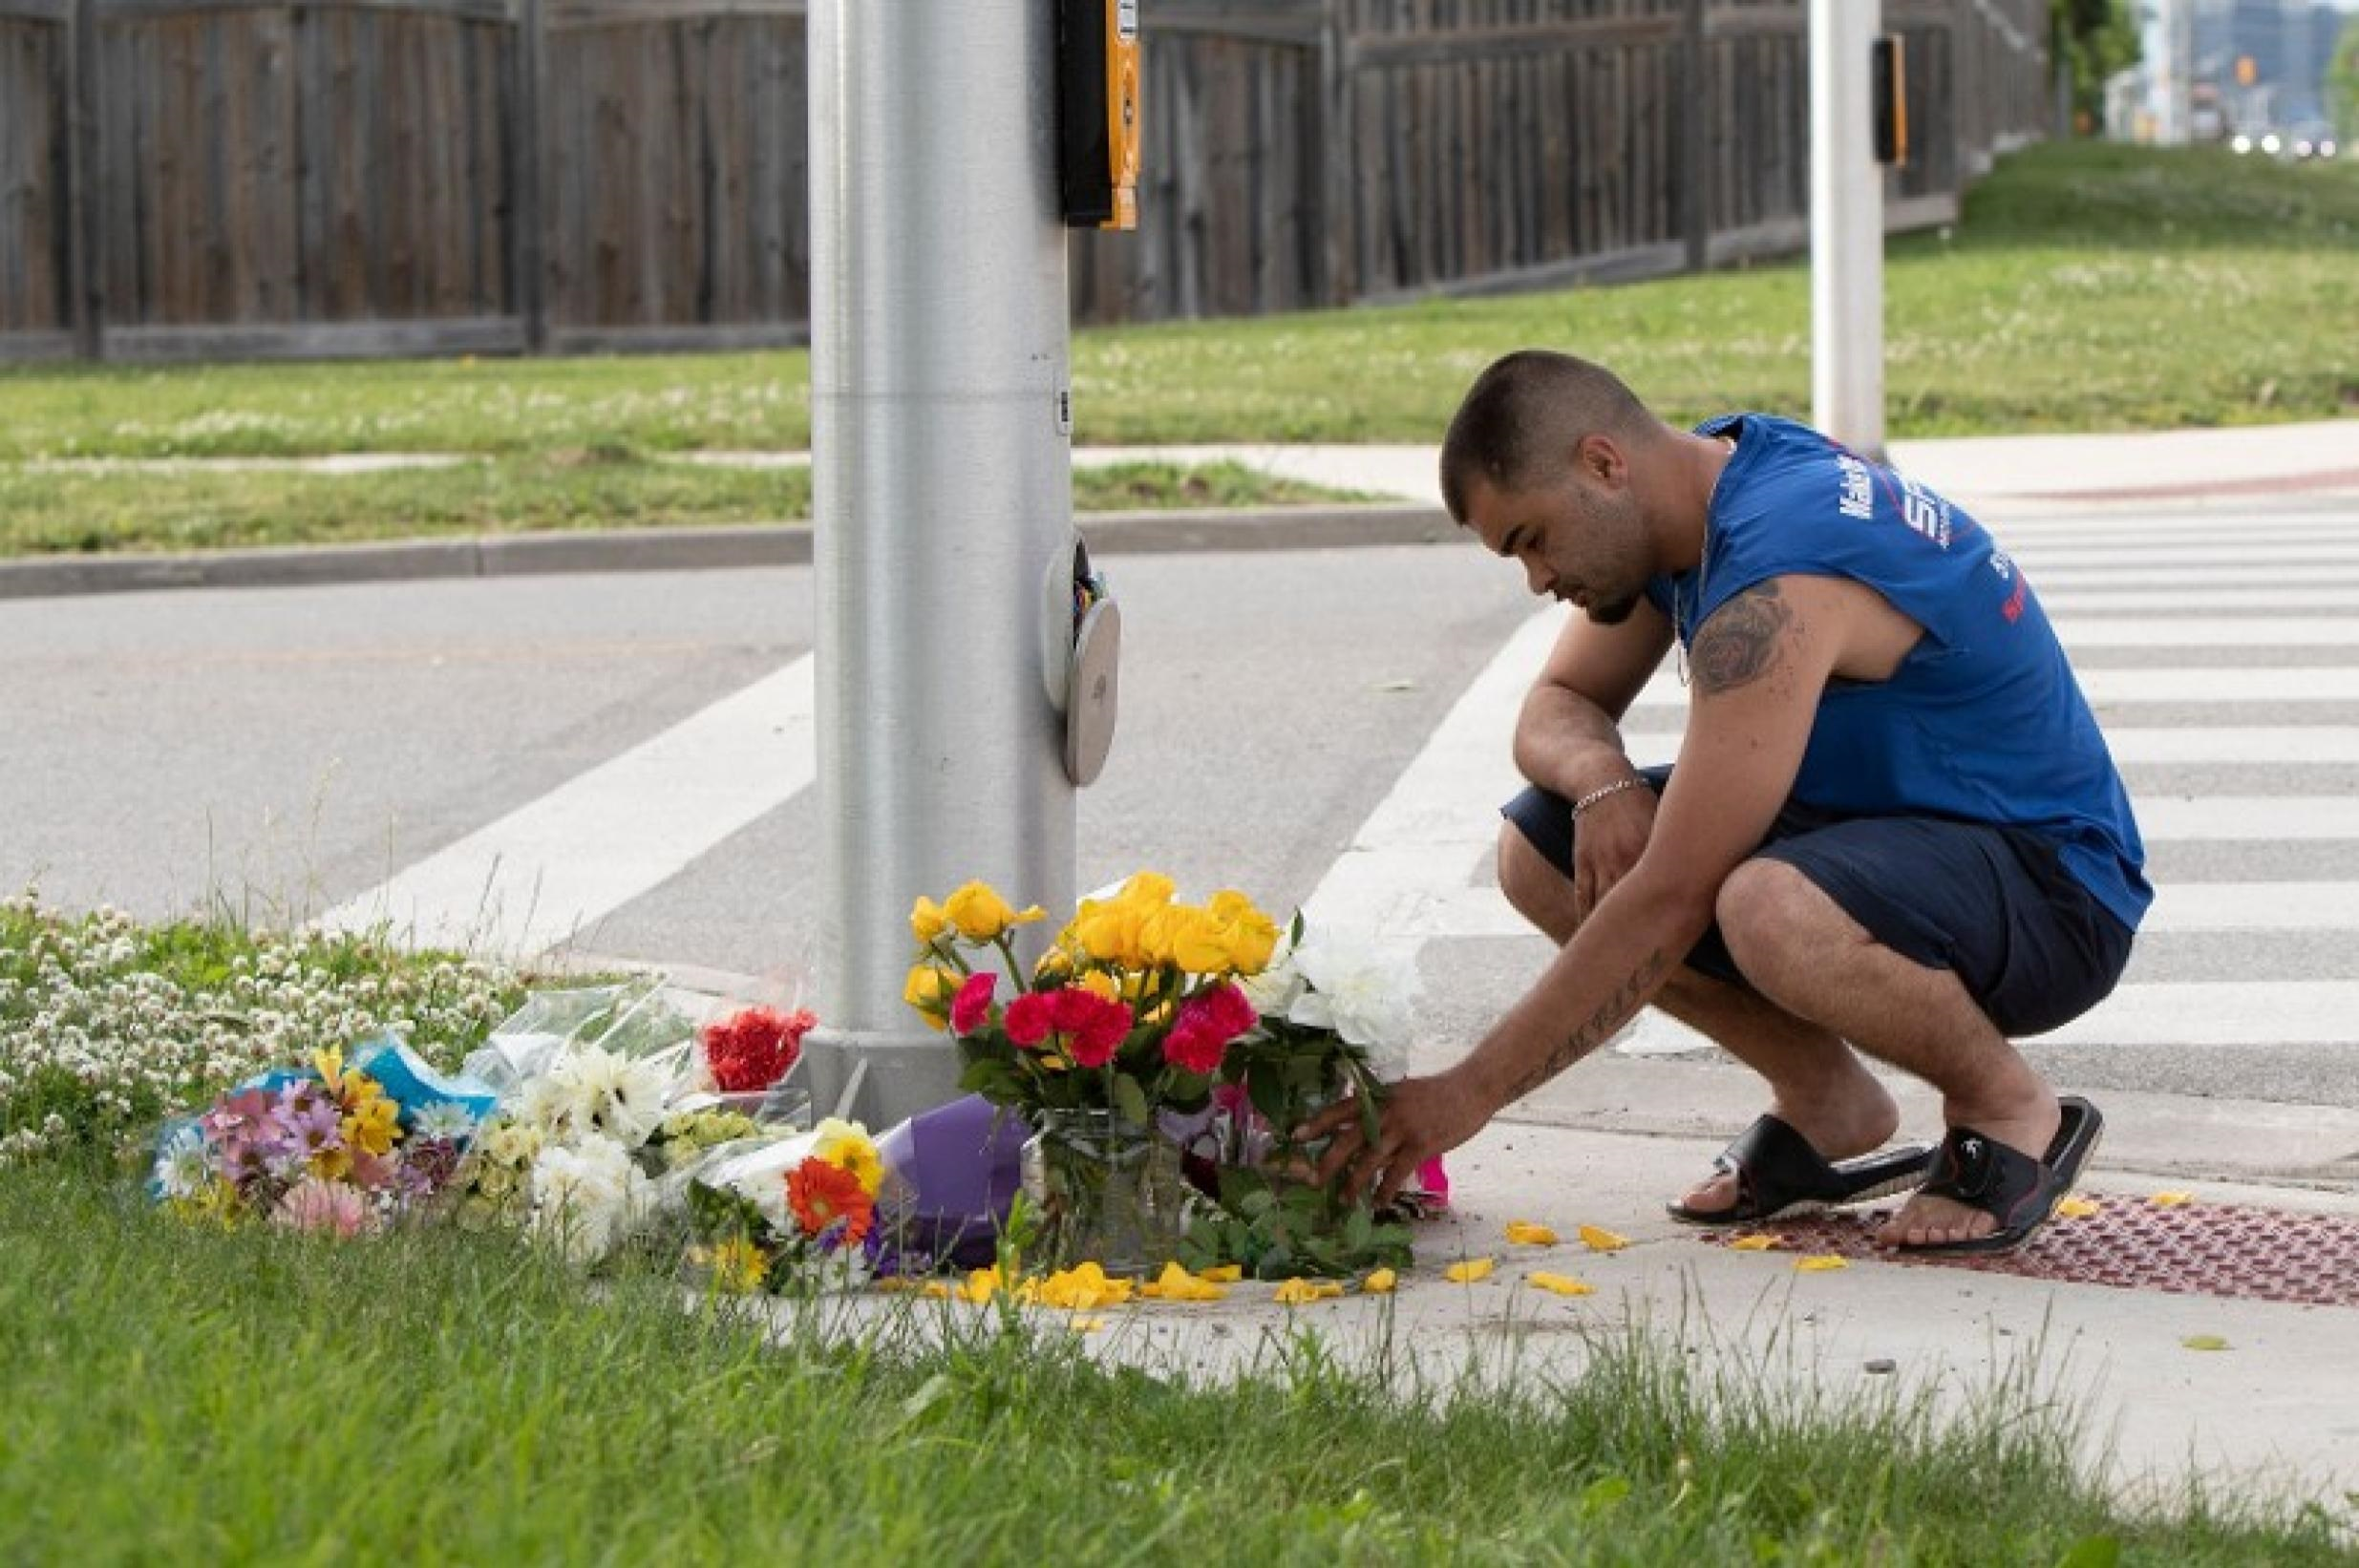 Four killed in Canada in Islamophobic attack